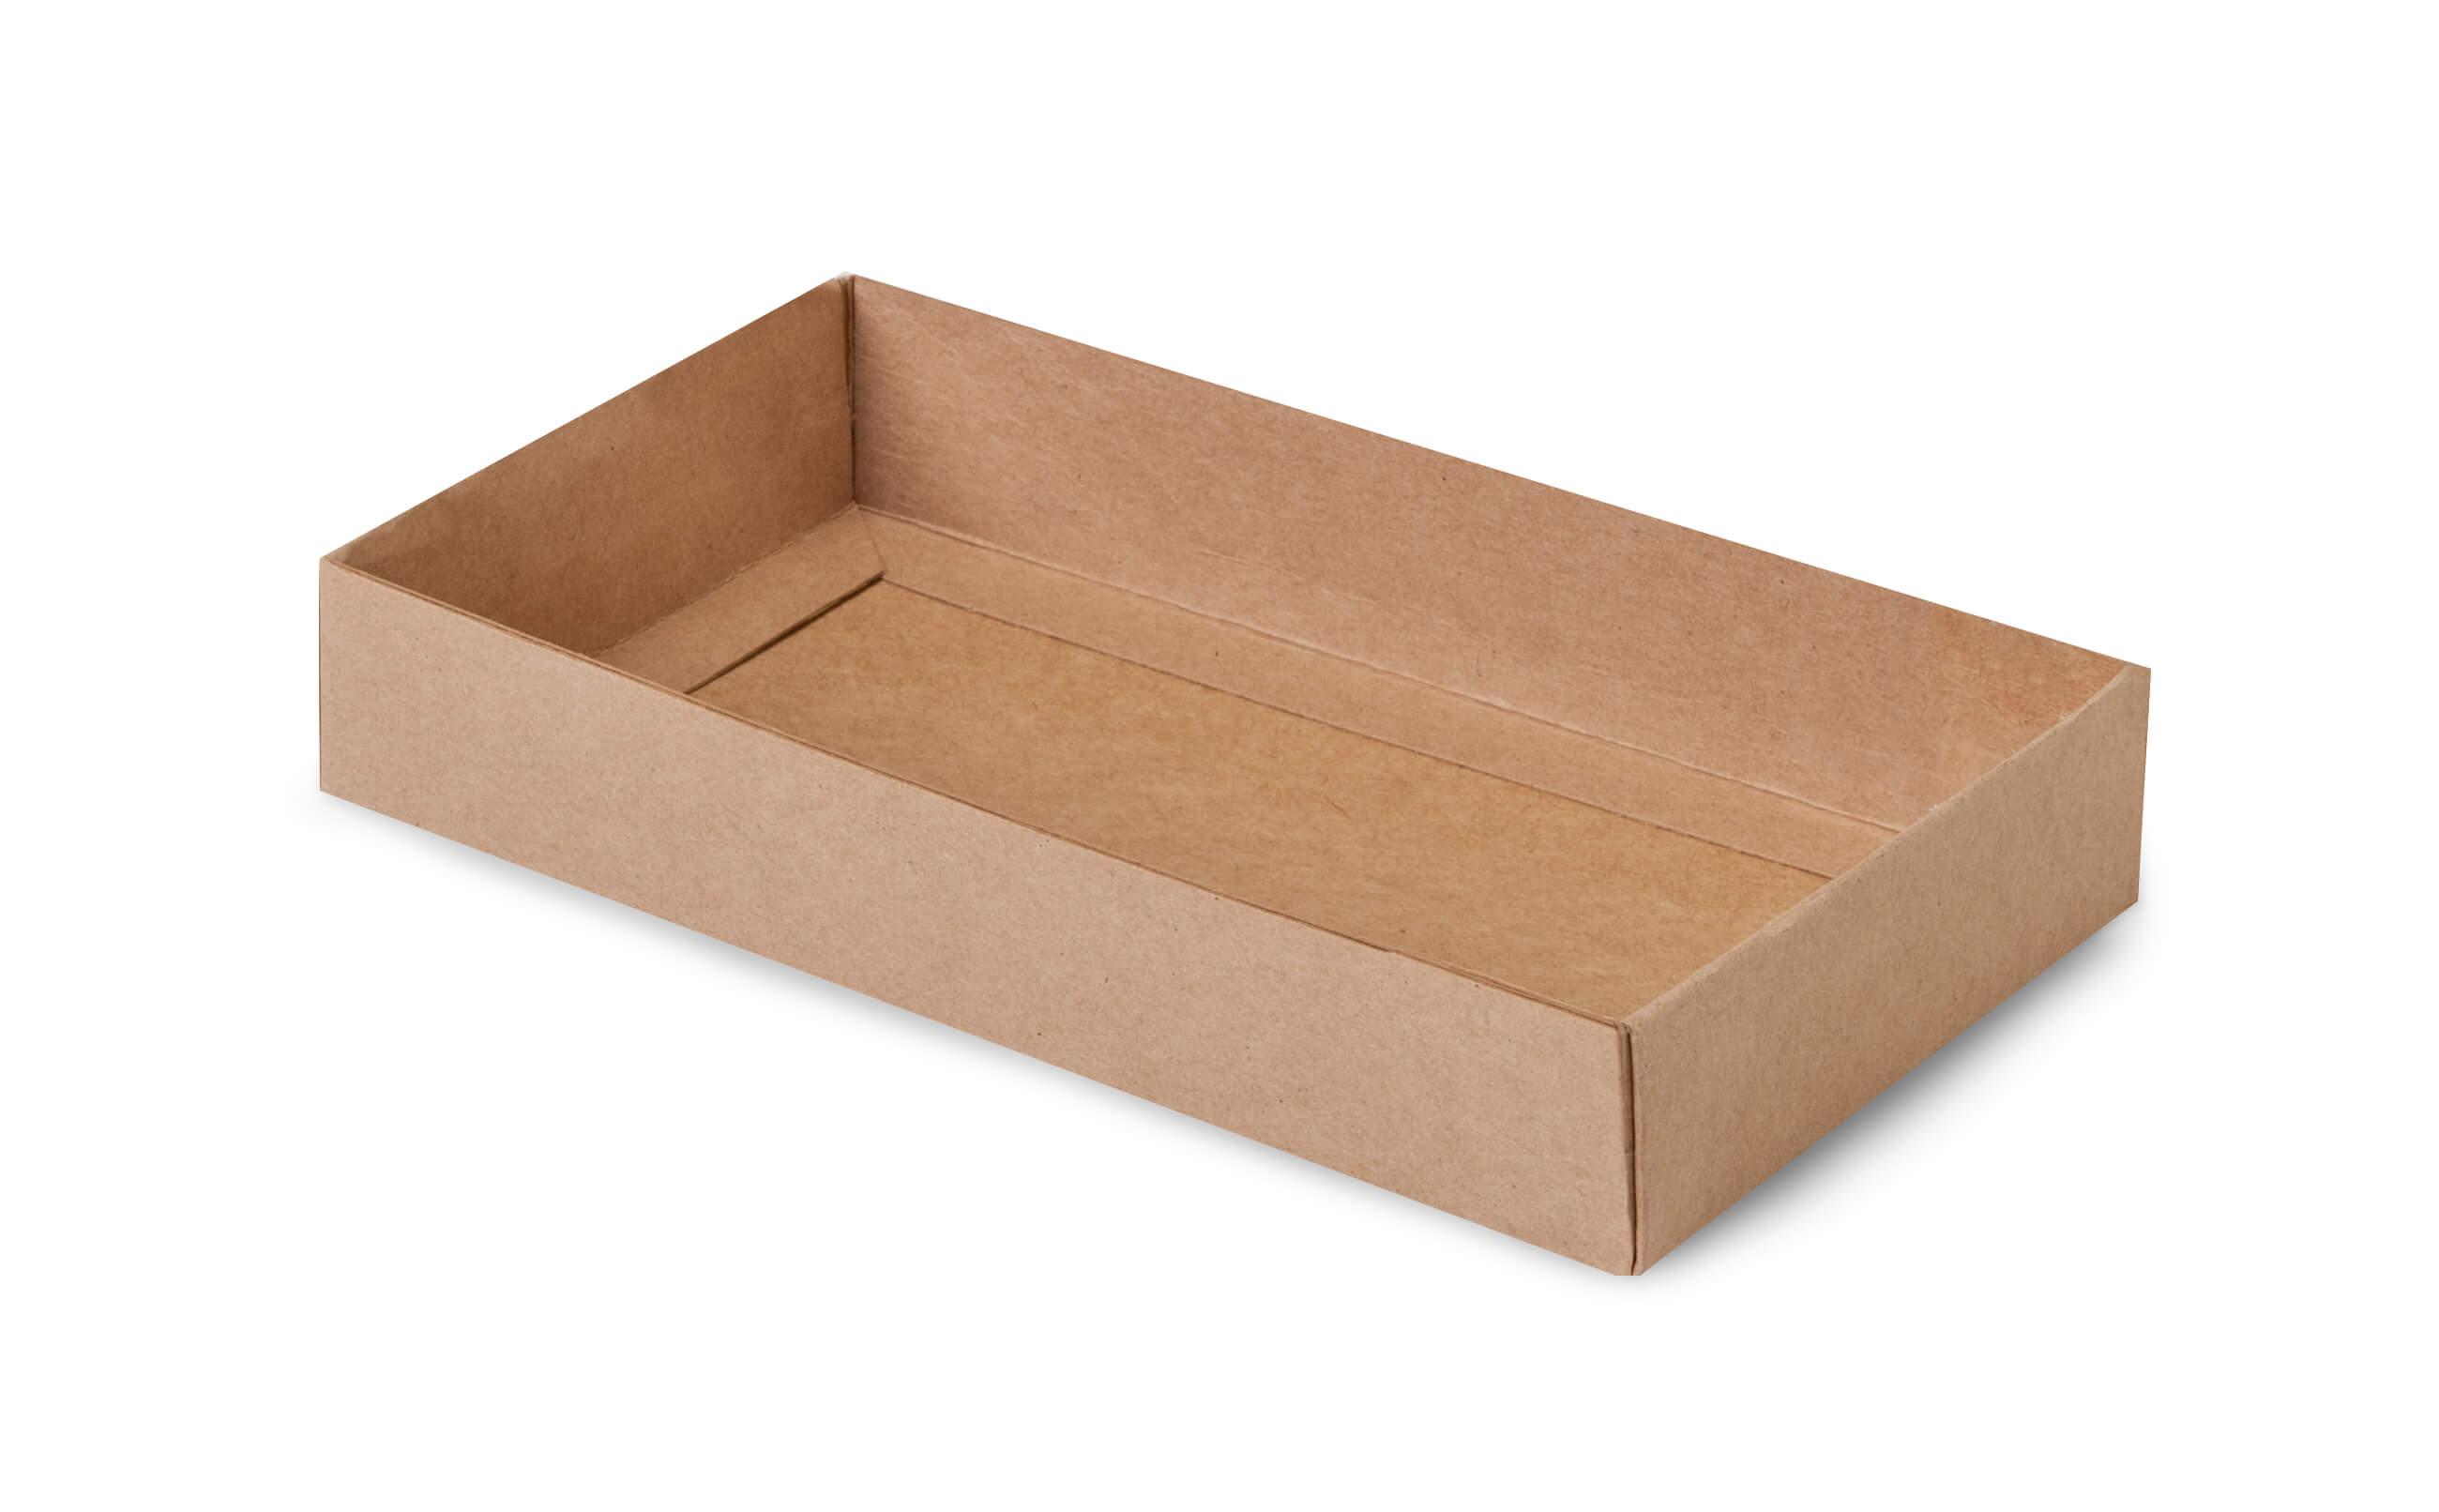 "Kraft Slide Open Candy Box Base, 8x4.25x1.25"", 100 Pack"